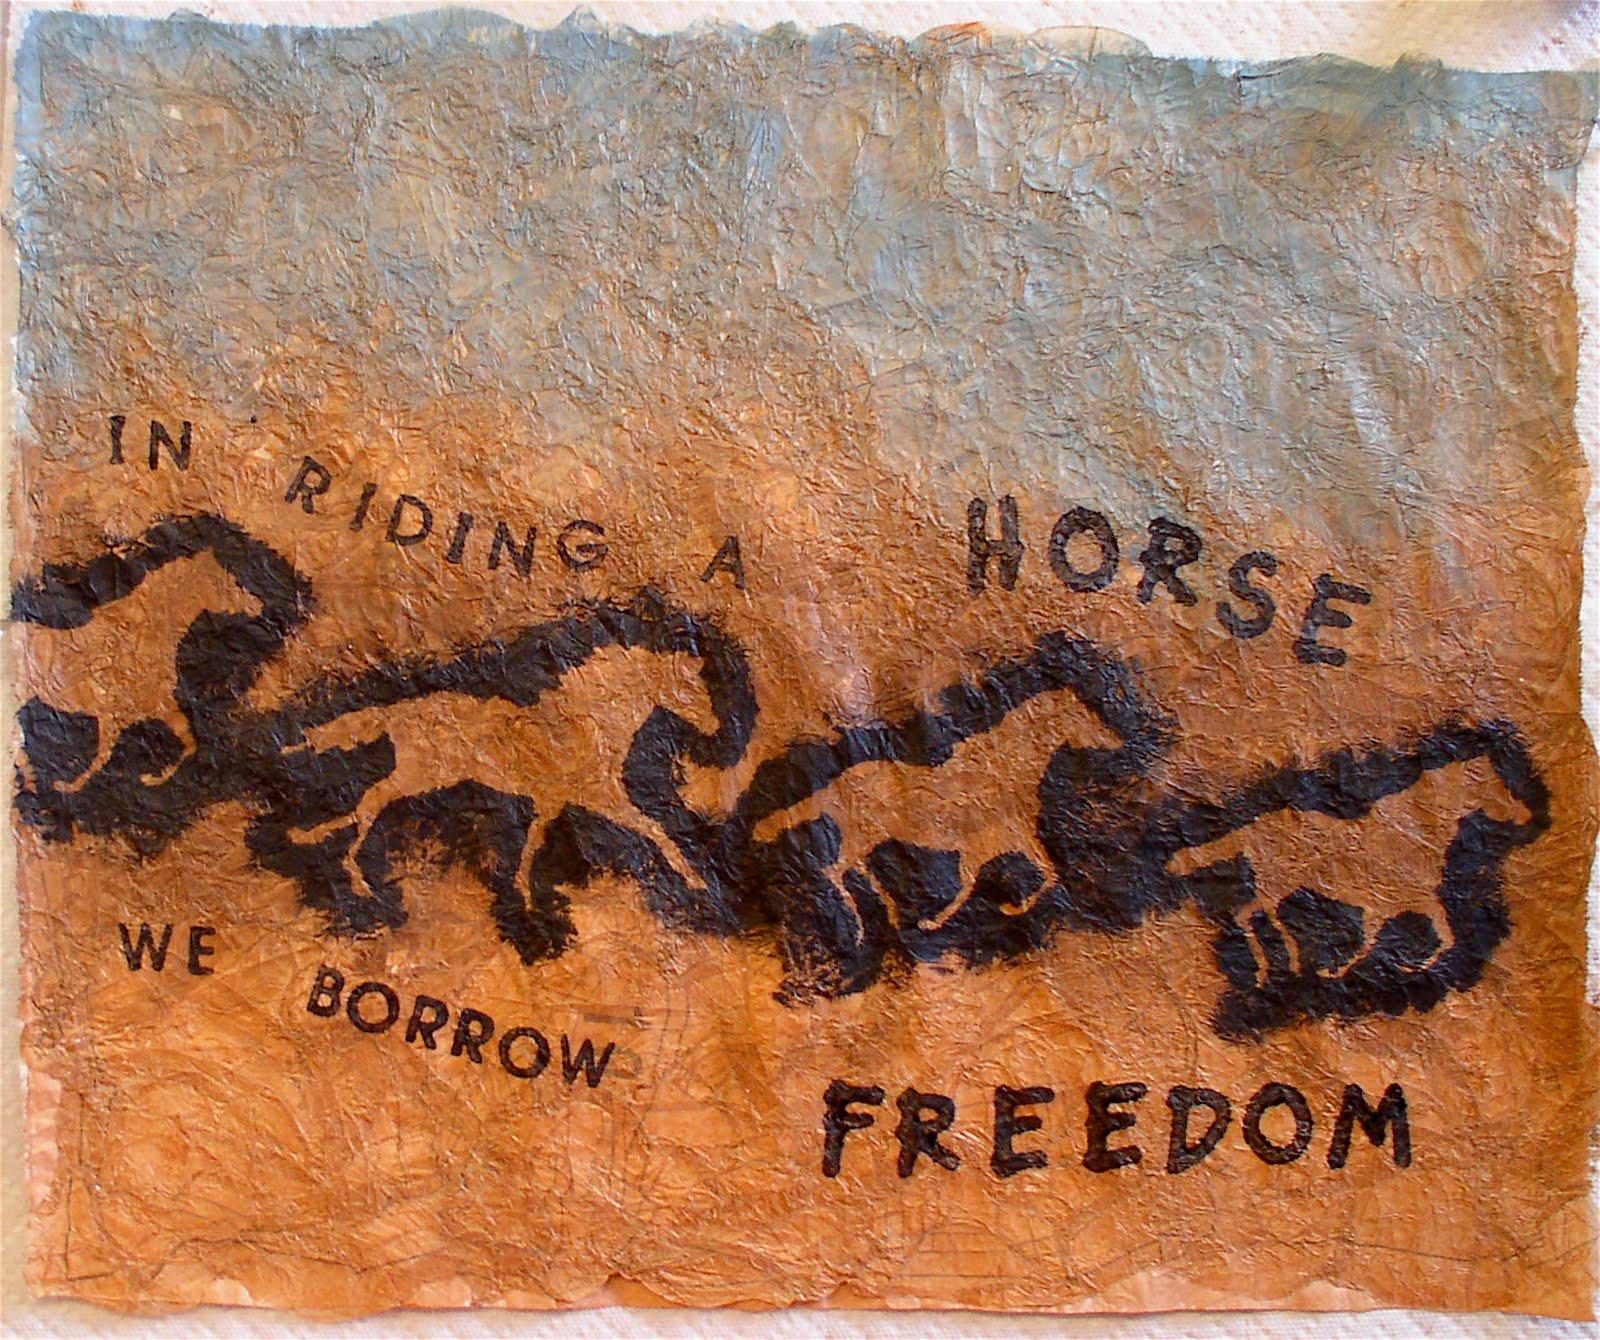 http://4.bp.blogspot.com/_2ssunQr1FDY/SwxHyP7xHBI/AAAAAAAADPU/HbXmL9l-3Bc/s1600/Fabric+Paper+Horses+ready+to+quilt.jpg